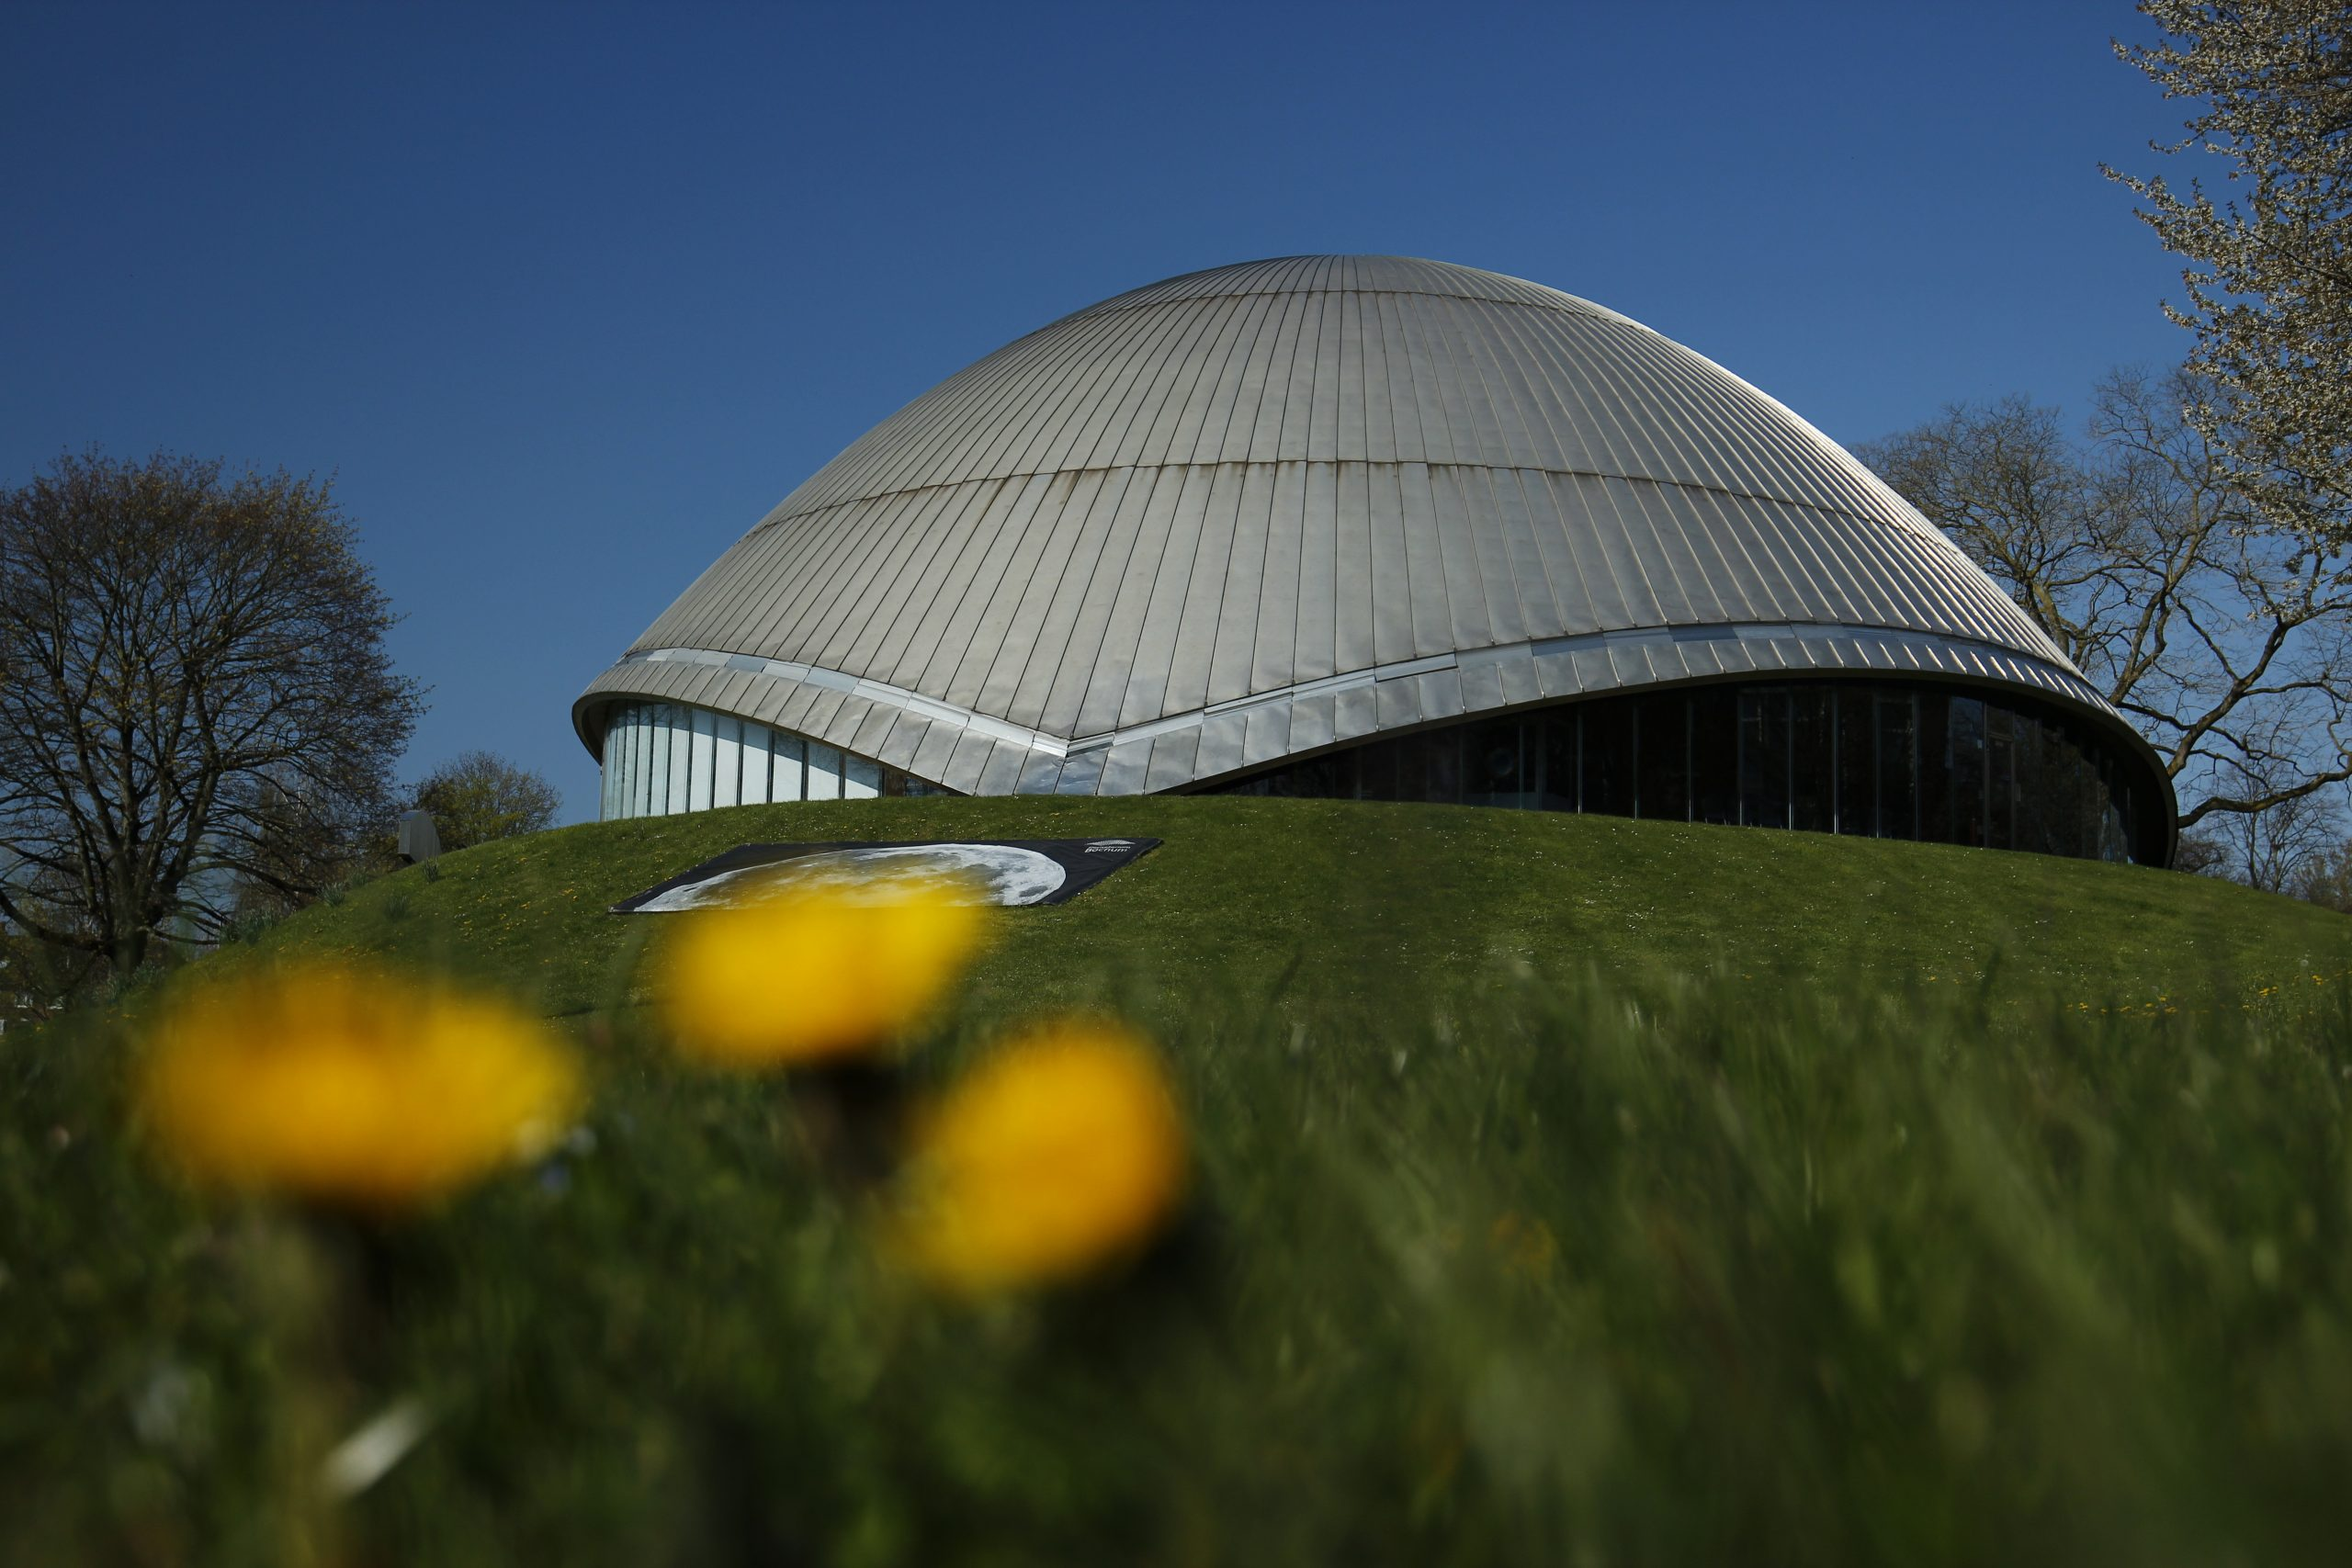 Exterior view of the Zeiss Planetarium Bochum.